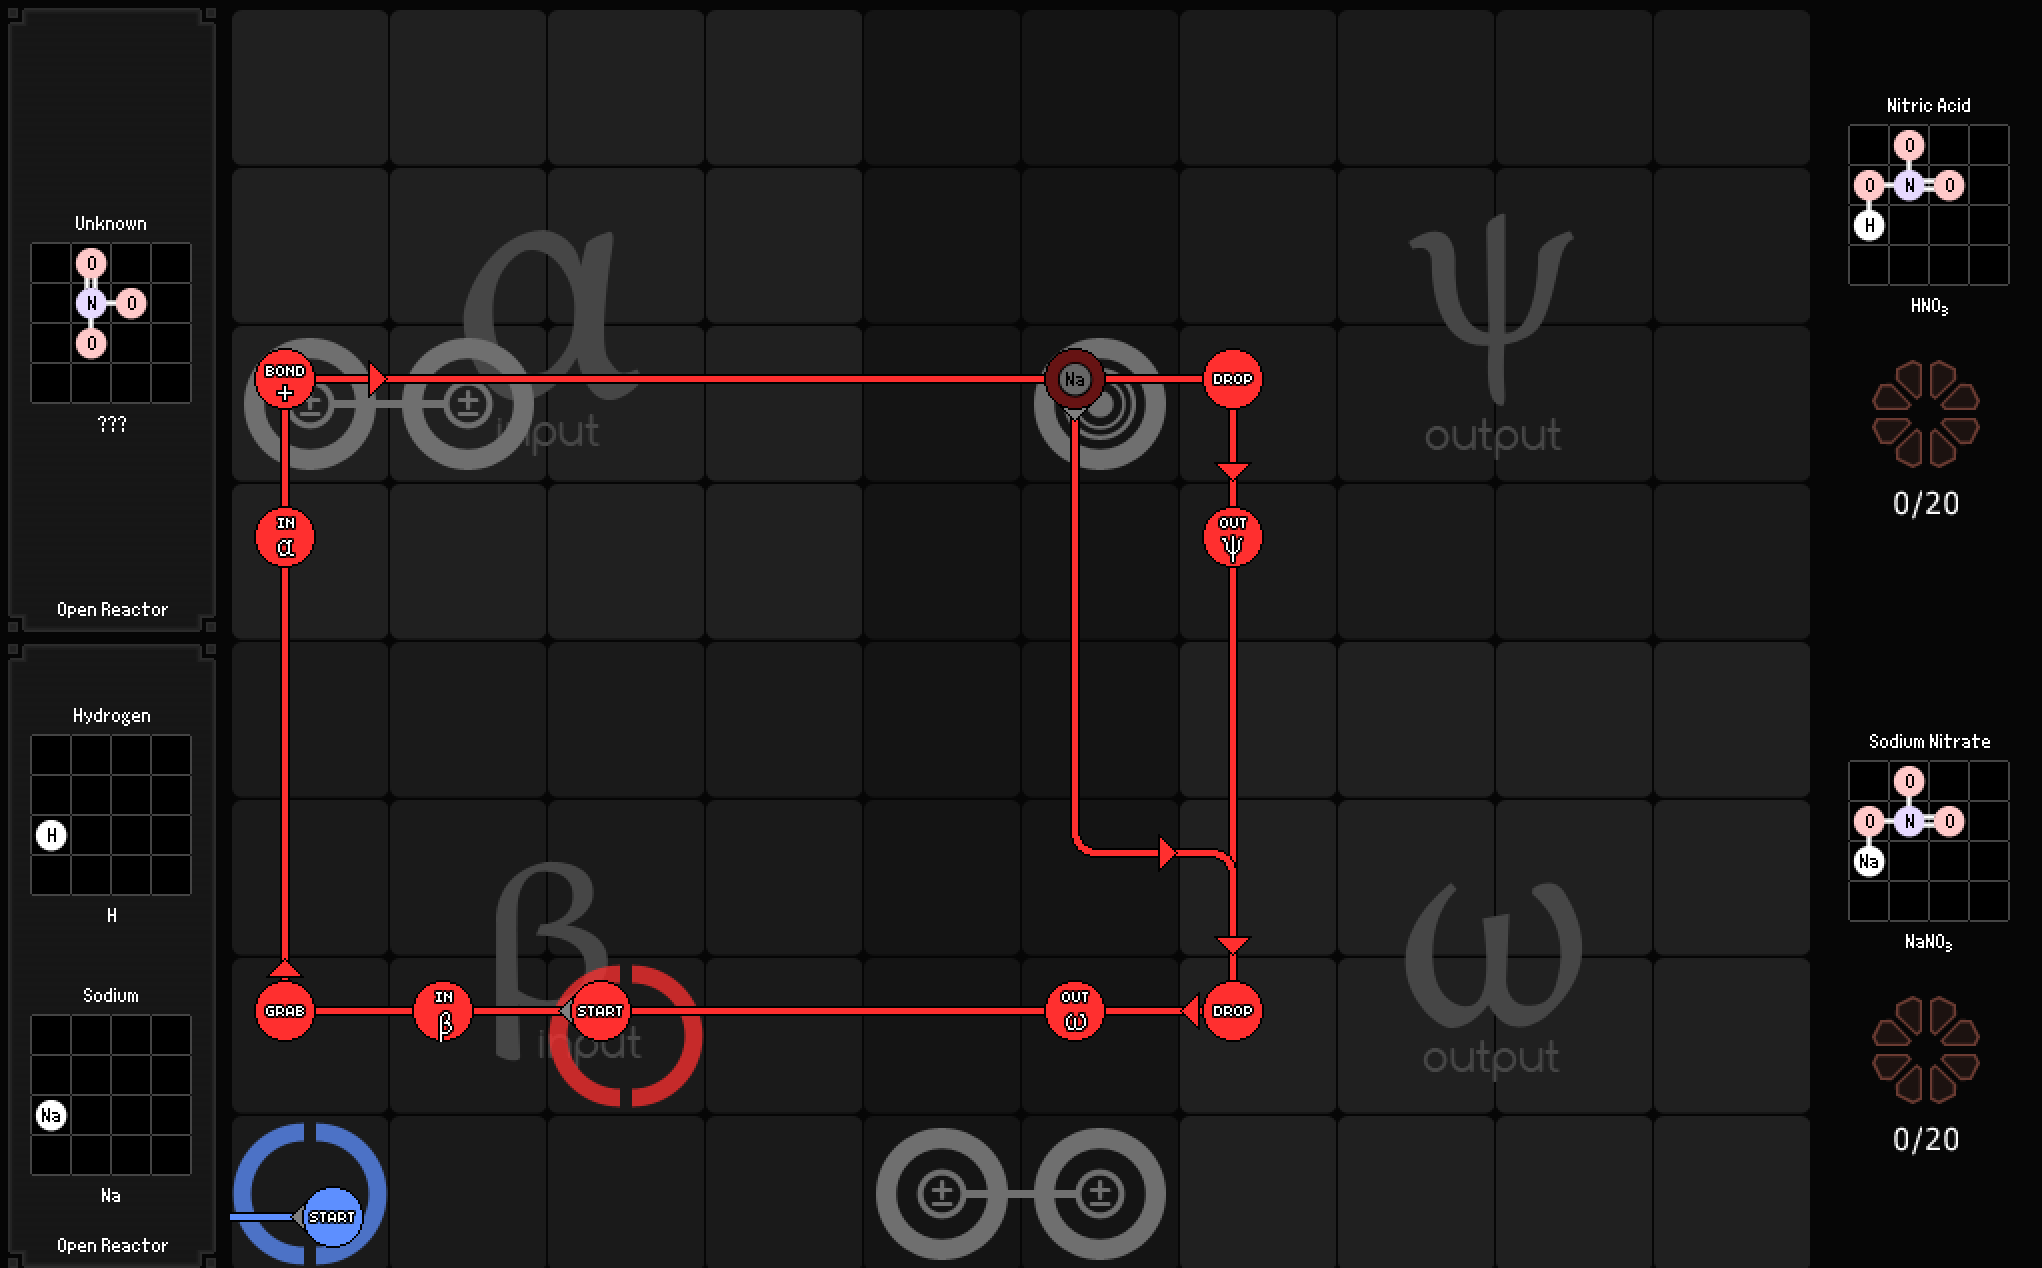 1_Story_Mode/4_Alkonost/SpaceChem-4.5.a/Reactor_4.png